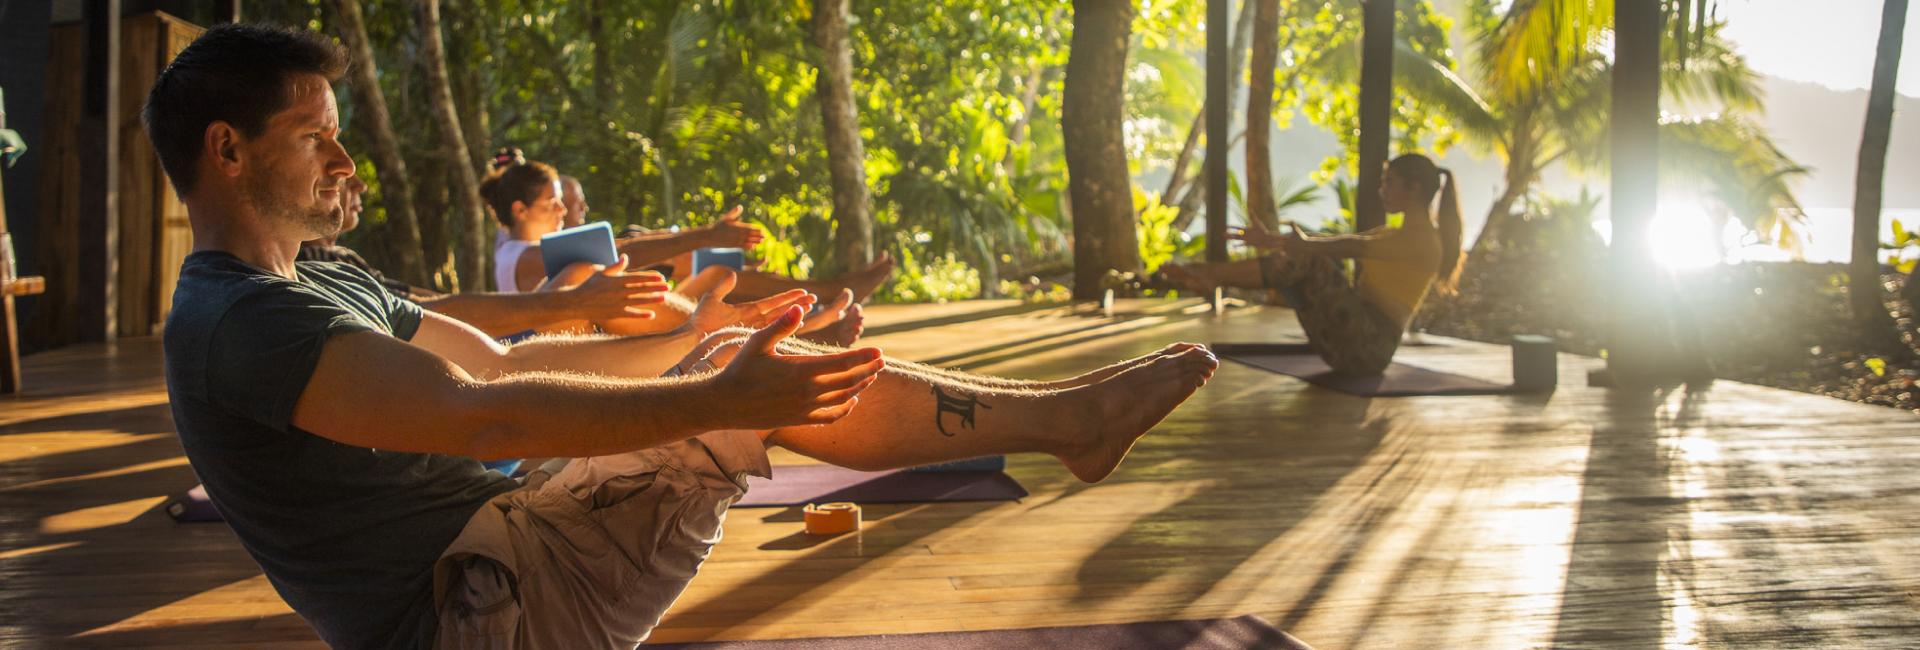 Yoga meditation in Costa Rica